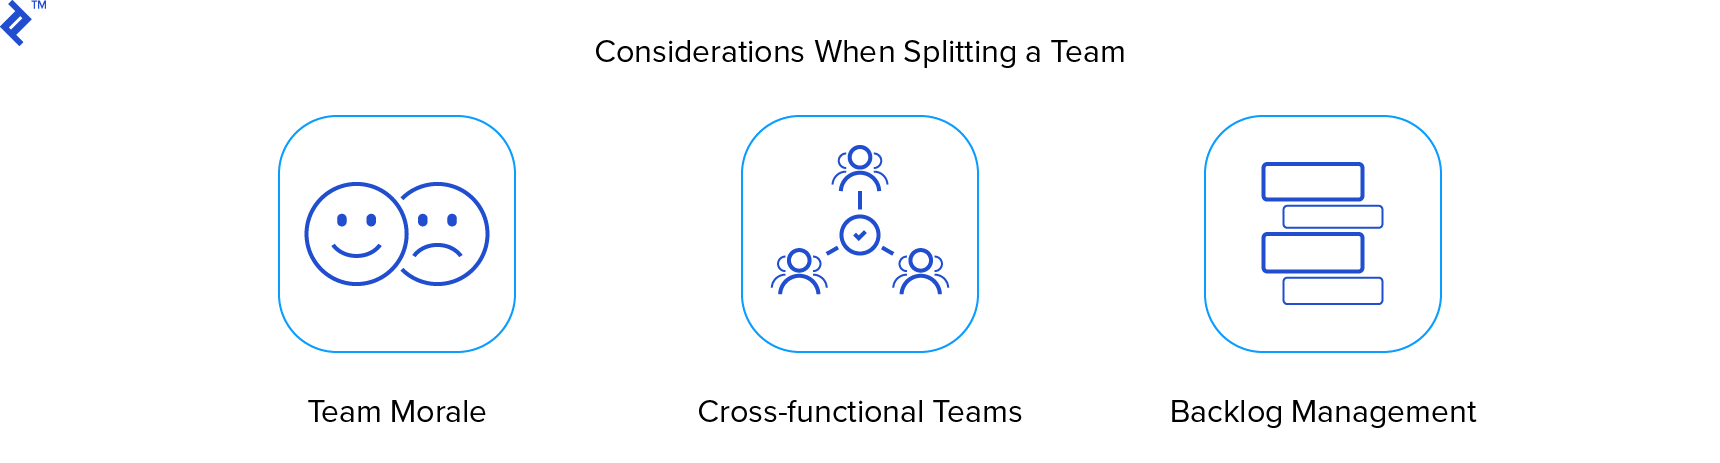 Considerations when splitting a team